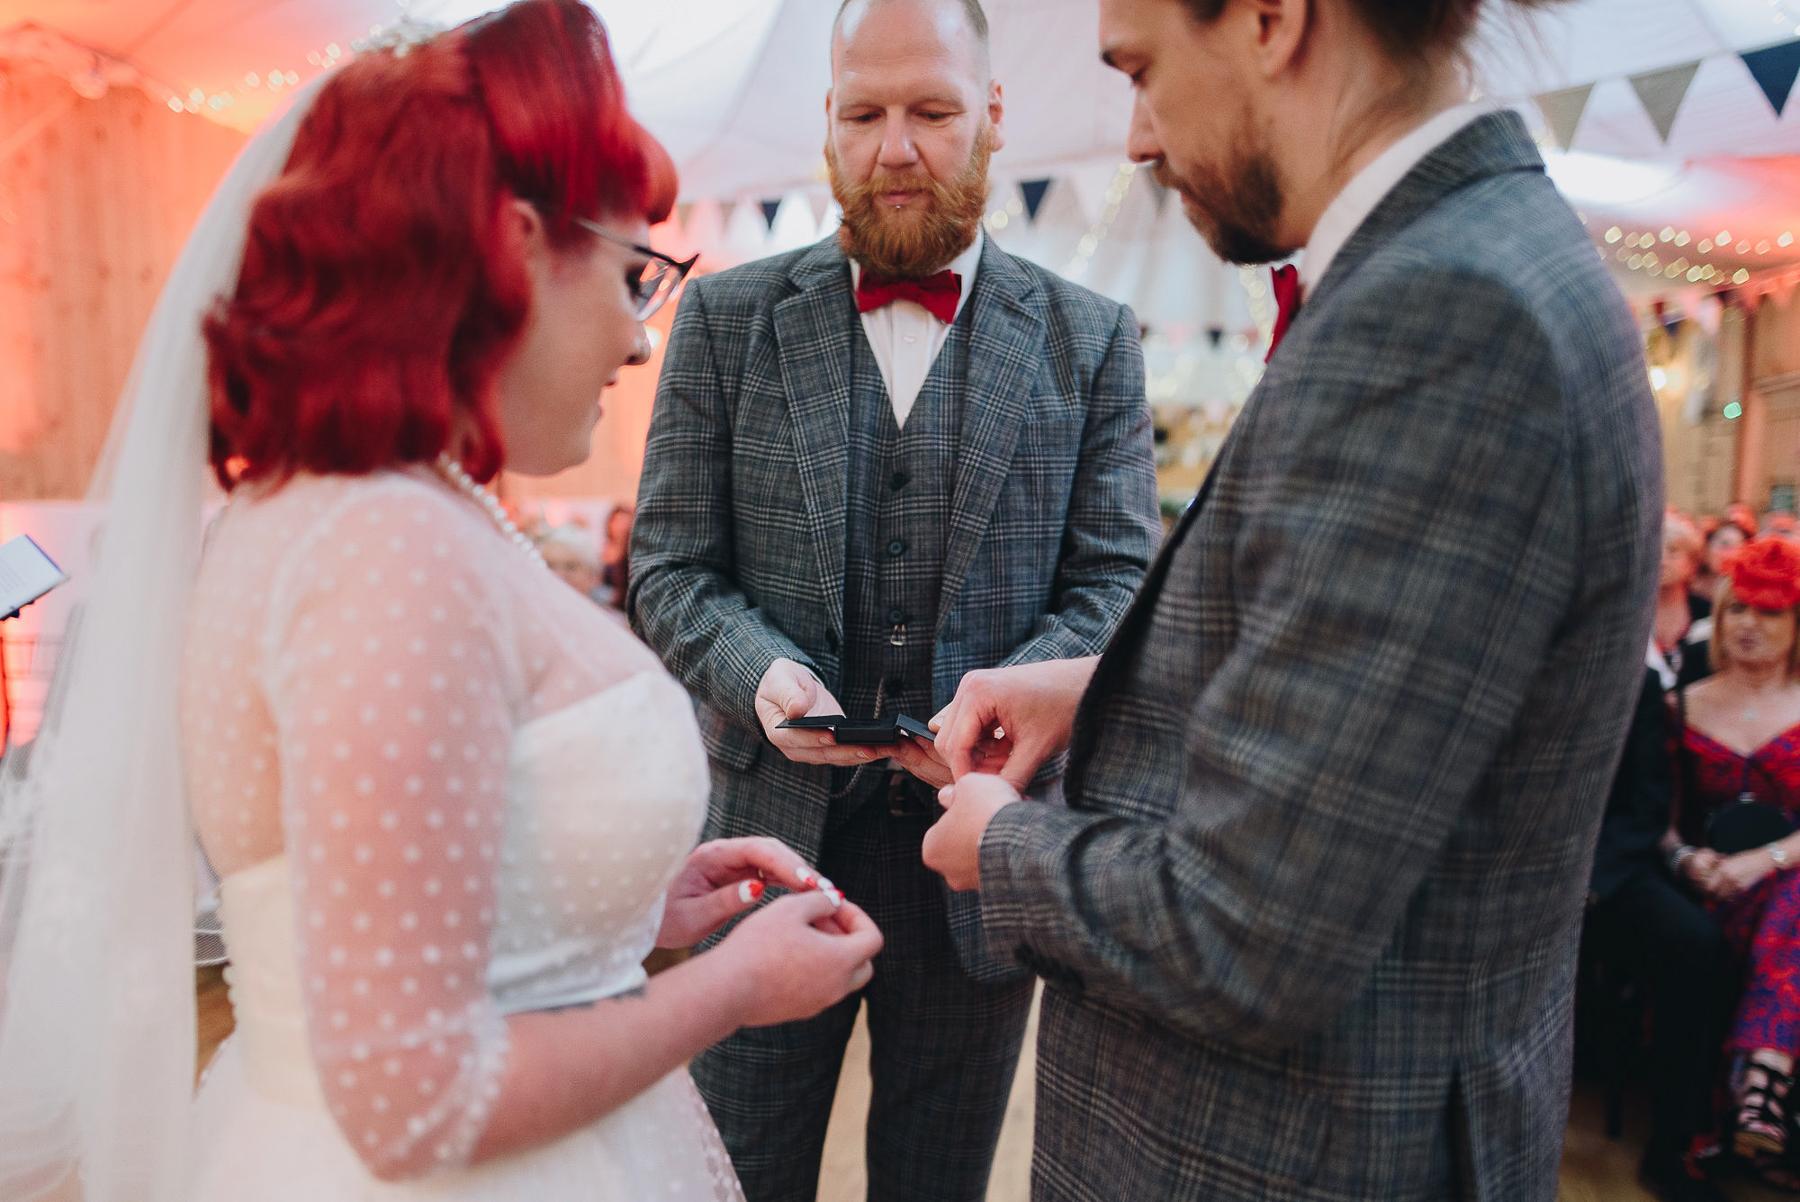 Wellbeing_Farm_Wedding_Photography_The_Pin-Up_Bride_Lara_Shaun-67.jpg